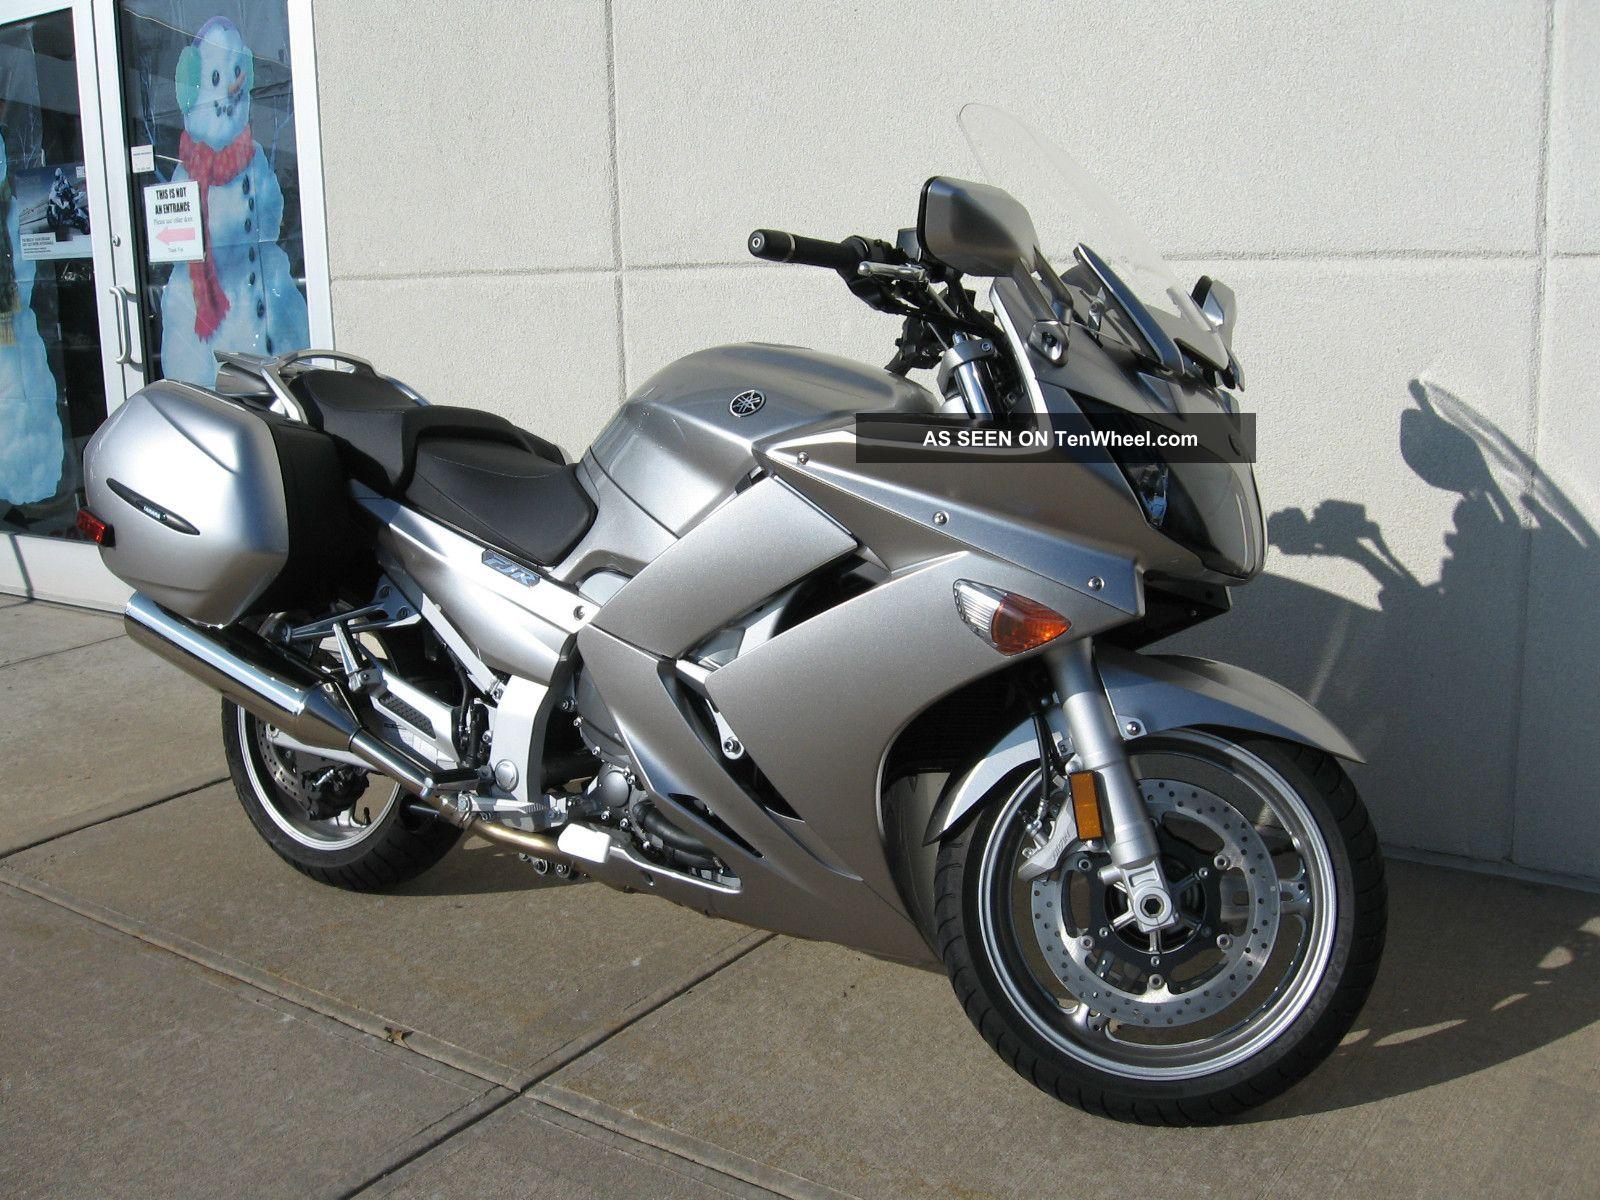 2011 Yamaha Fjr 1300 FJR photo